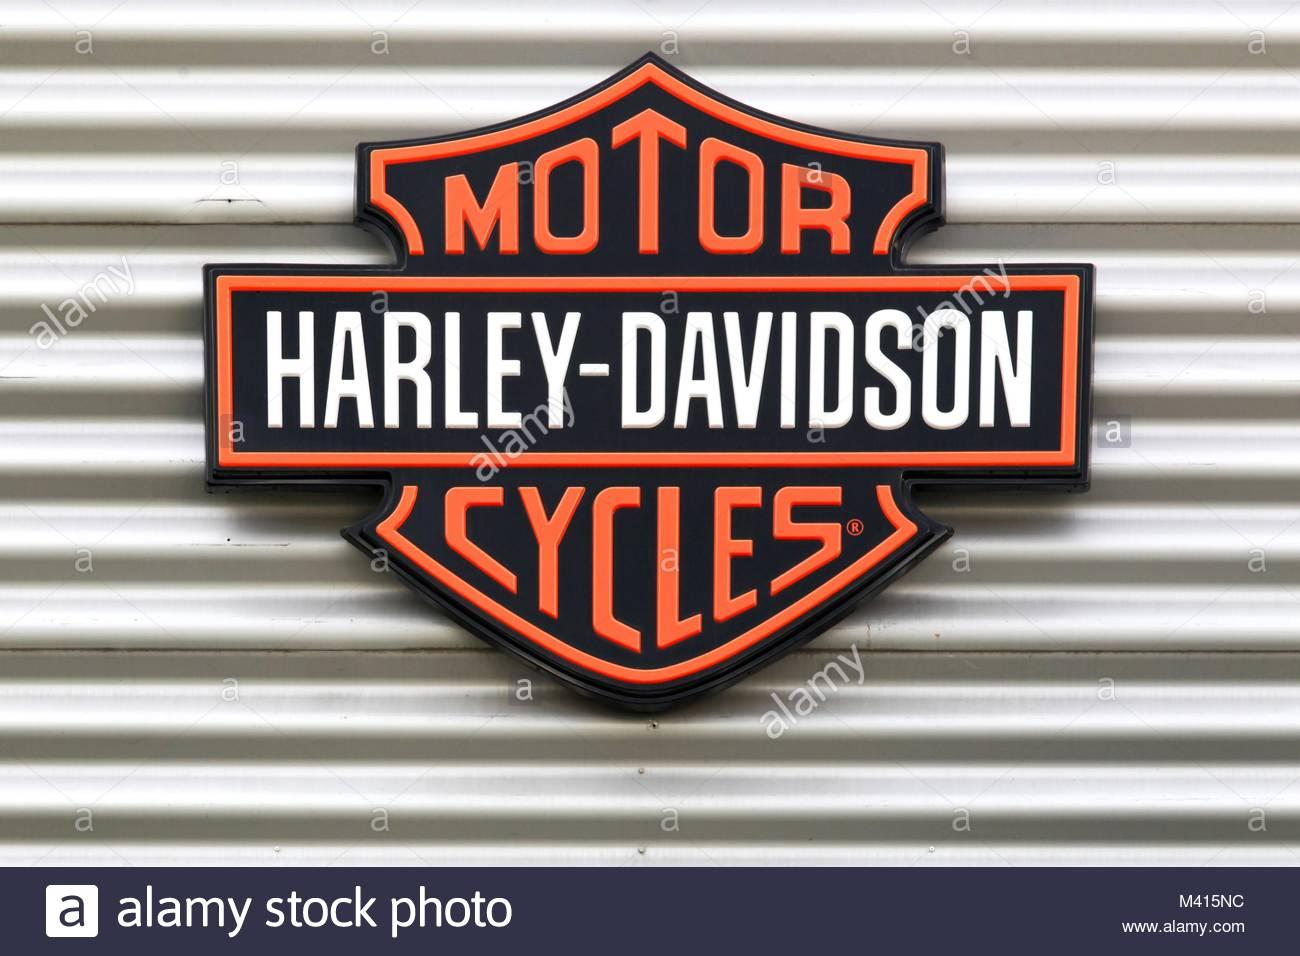 harley davidson store stock photos harley davidson store stock images alamy. Black Bedroom Furniture Sets. Home Design Ideas